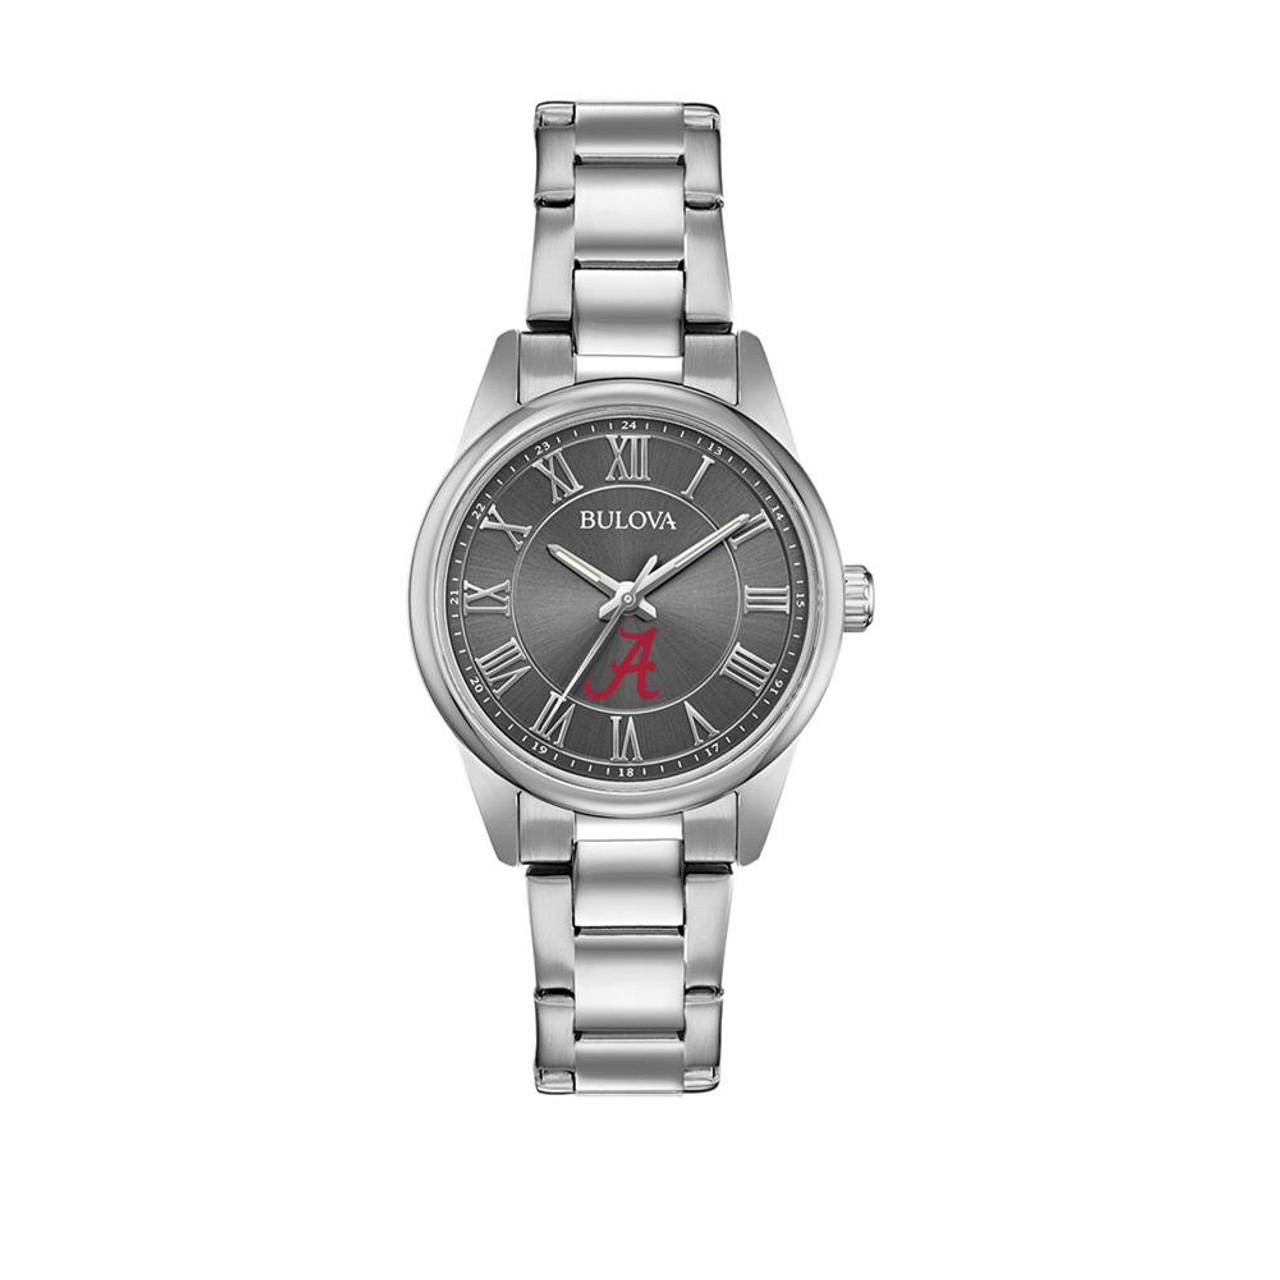 Women's Alabama Crimson Tide Bama Bulova Watch Black/Silver Watch